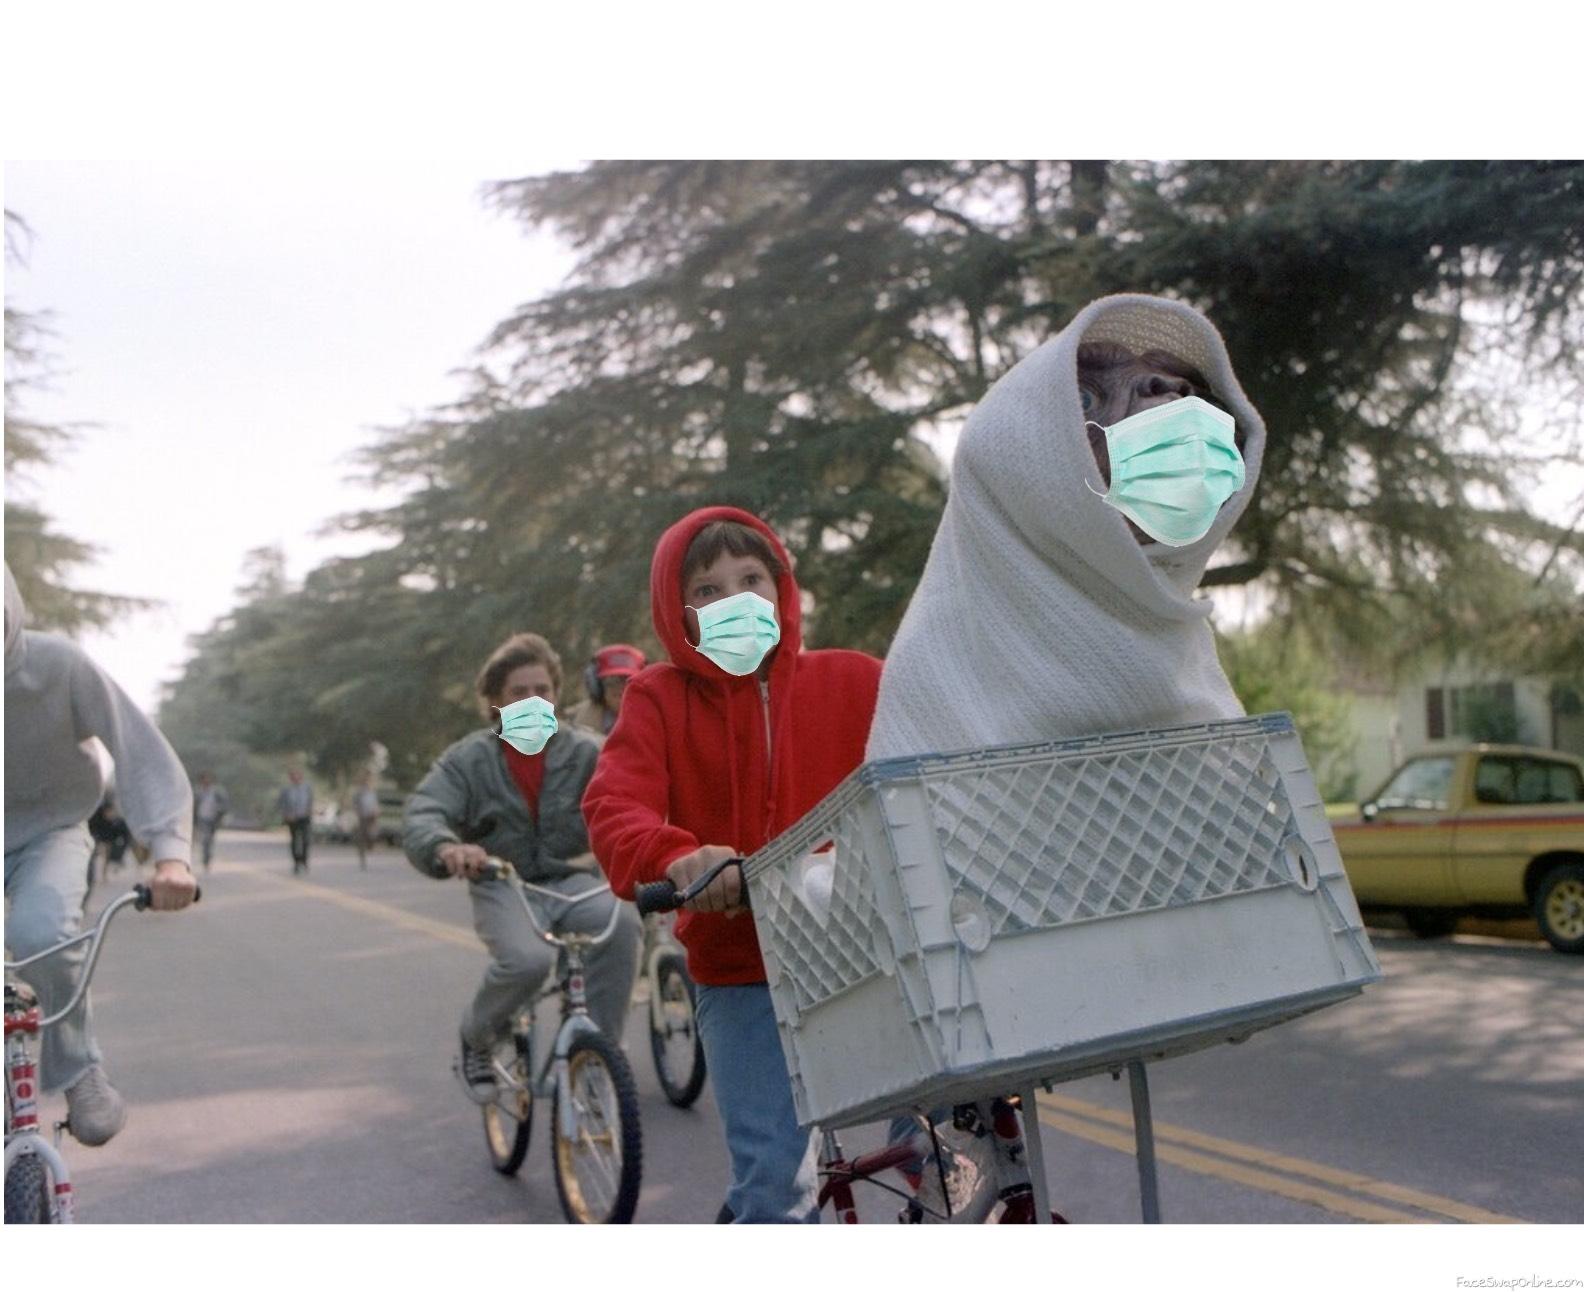 E.T during Coronavirus lockdown